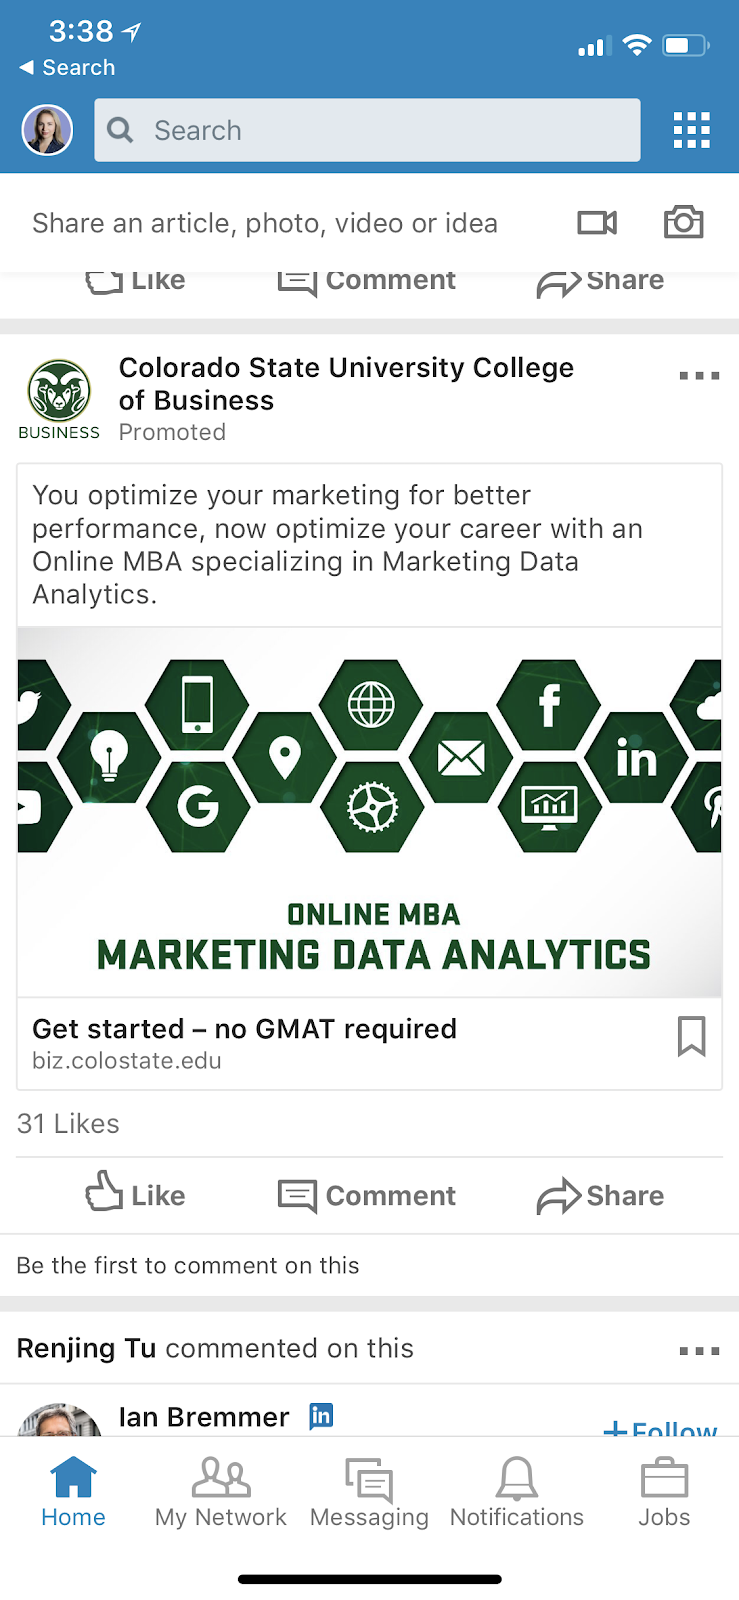 linkedin mobile ads